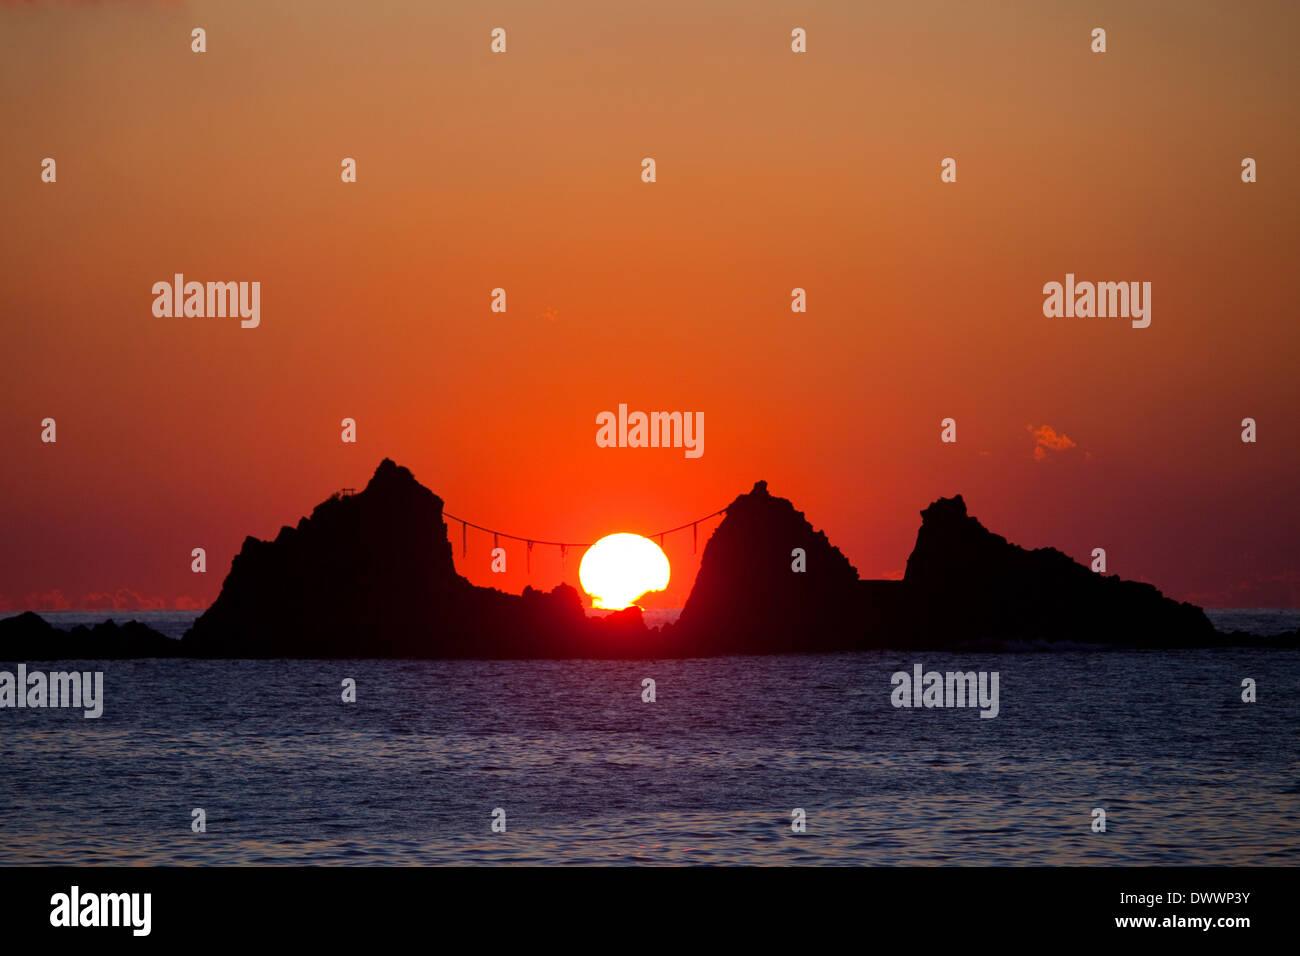 Rocks in sea at dawn, Kanagawa Prefecture, Japan - Stock Image